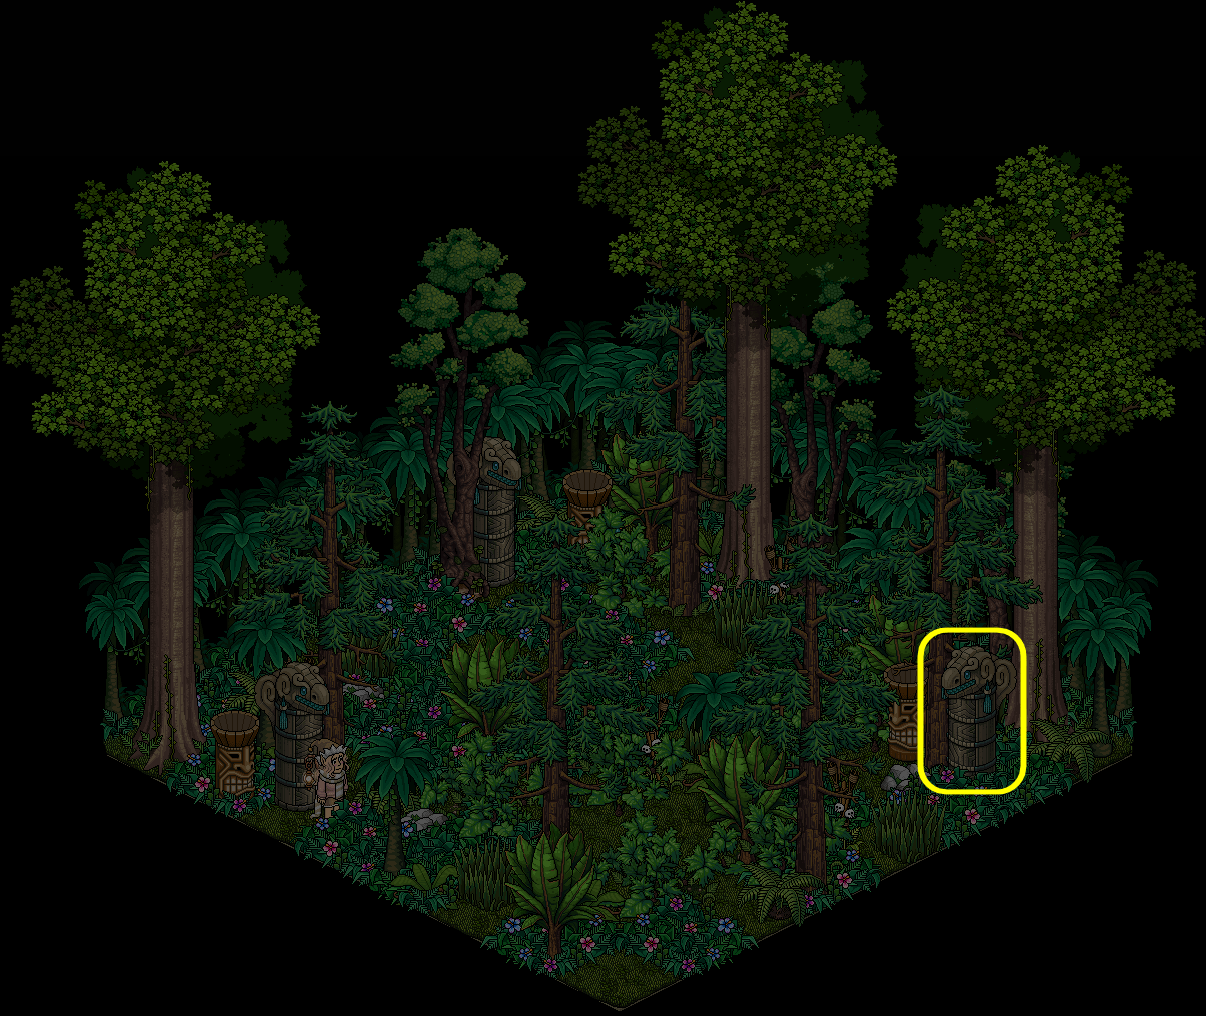 2.2 - Forêt profonde de Tiki Tuha 5